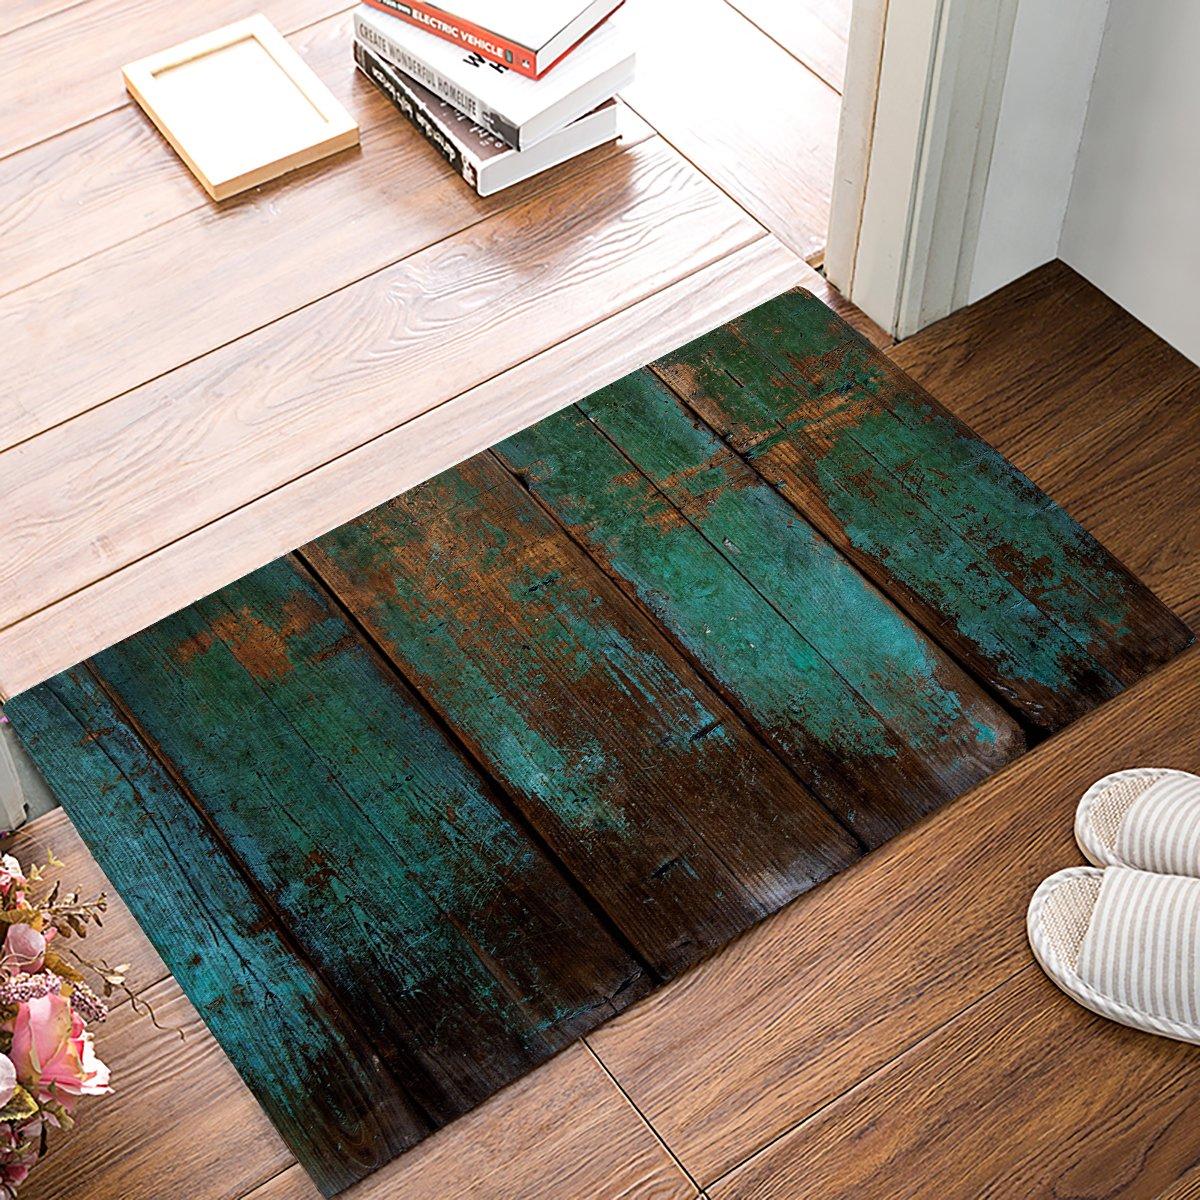 Chic D Farmhouse Doormat, Rustic Wood Barn Country Indoor/Outdoor Non-slip Rubber Welcome Mats Floor Rug for Bathroom/Front Entryway